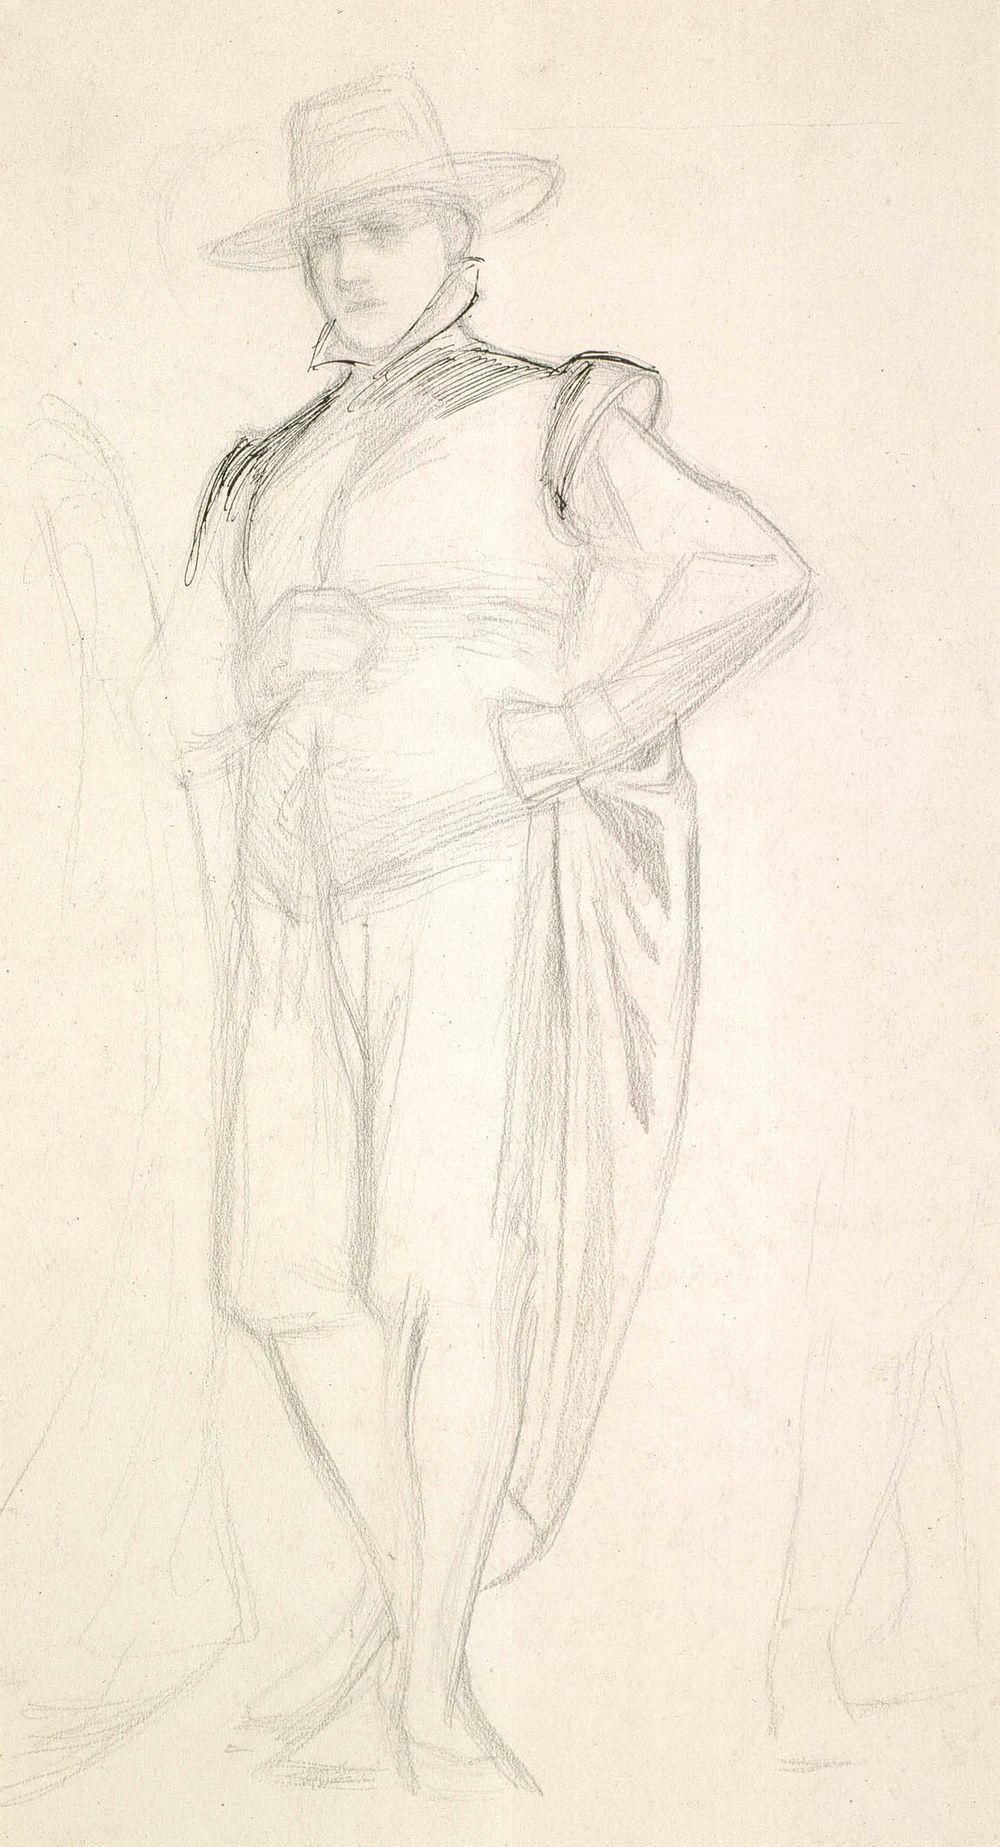 Seisova mies espanjalaisessa puvussa